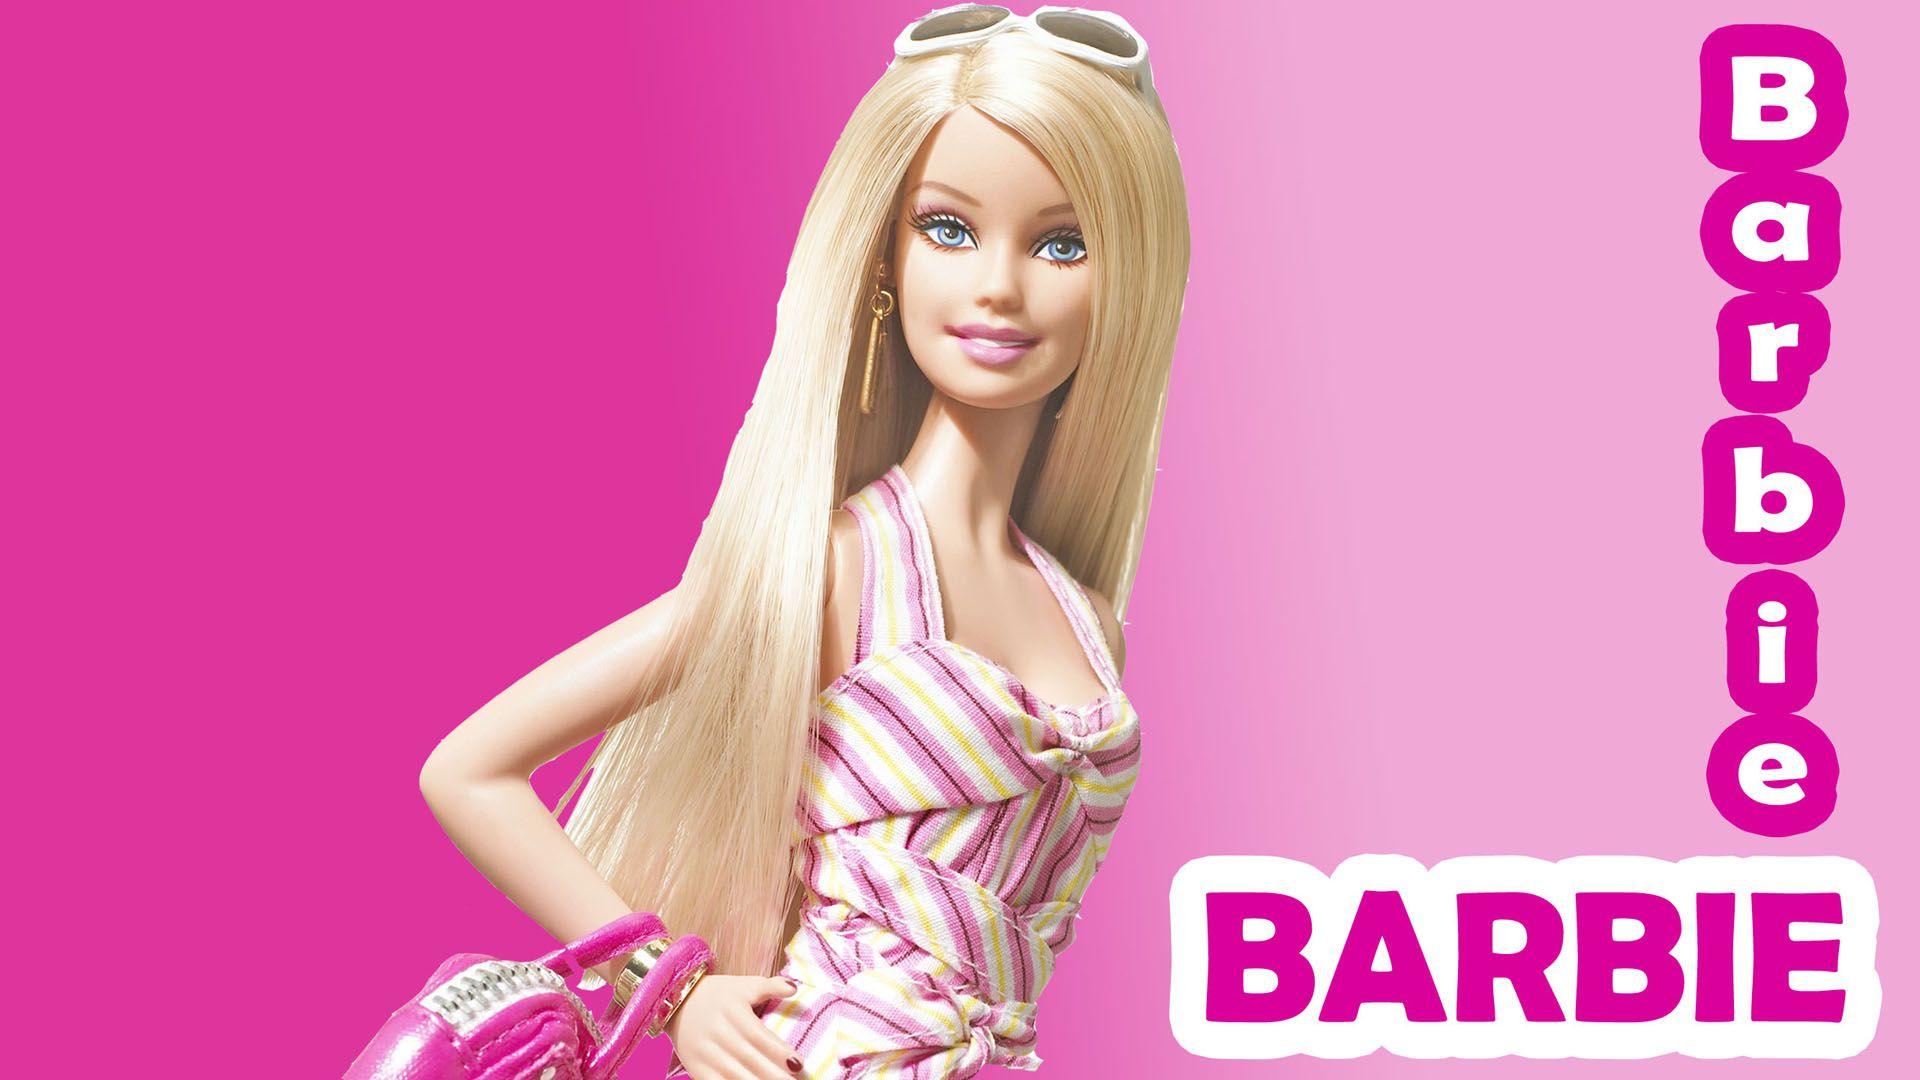 Barbie cartoon barbie 19201080 hd barbie cartoons pictures barbie cartoon barbie 19201080 hd barbie cartoons pictures voltagebd Image collections